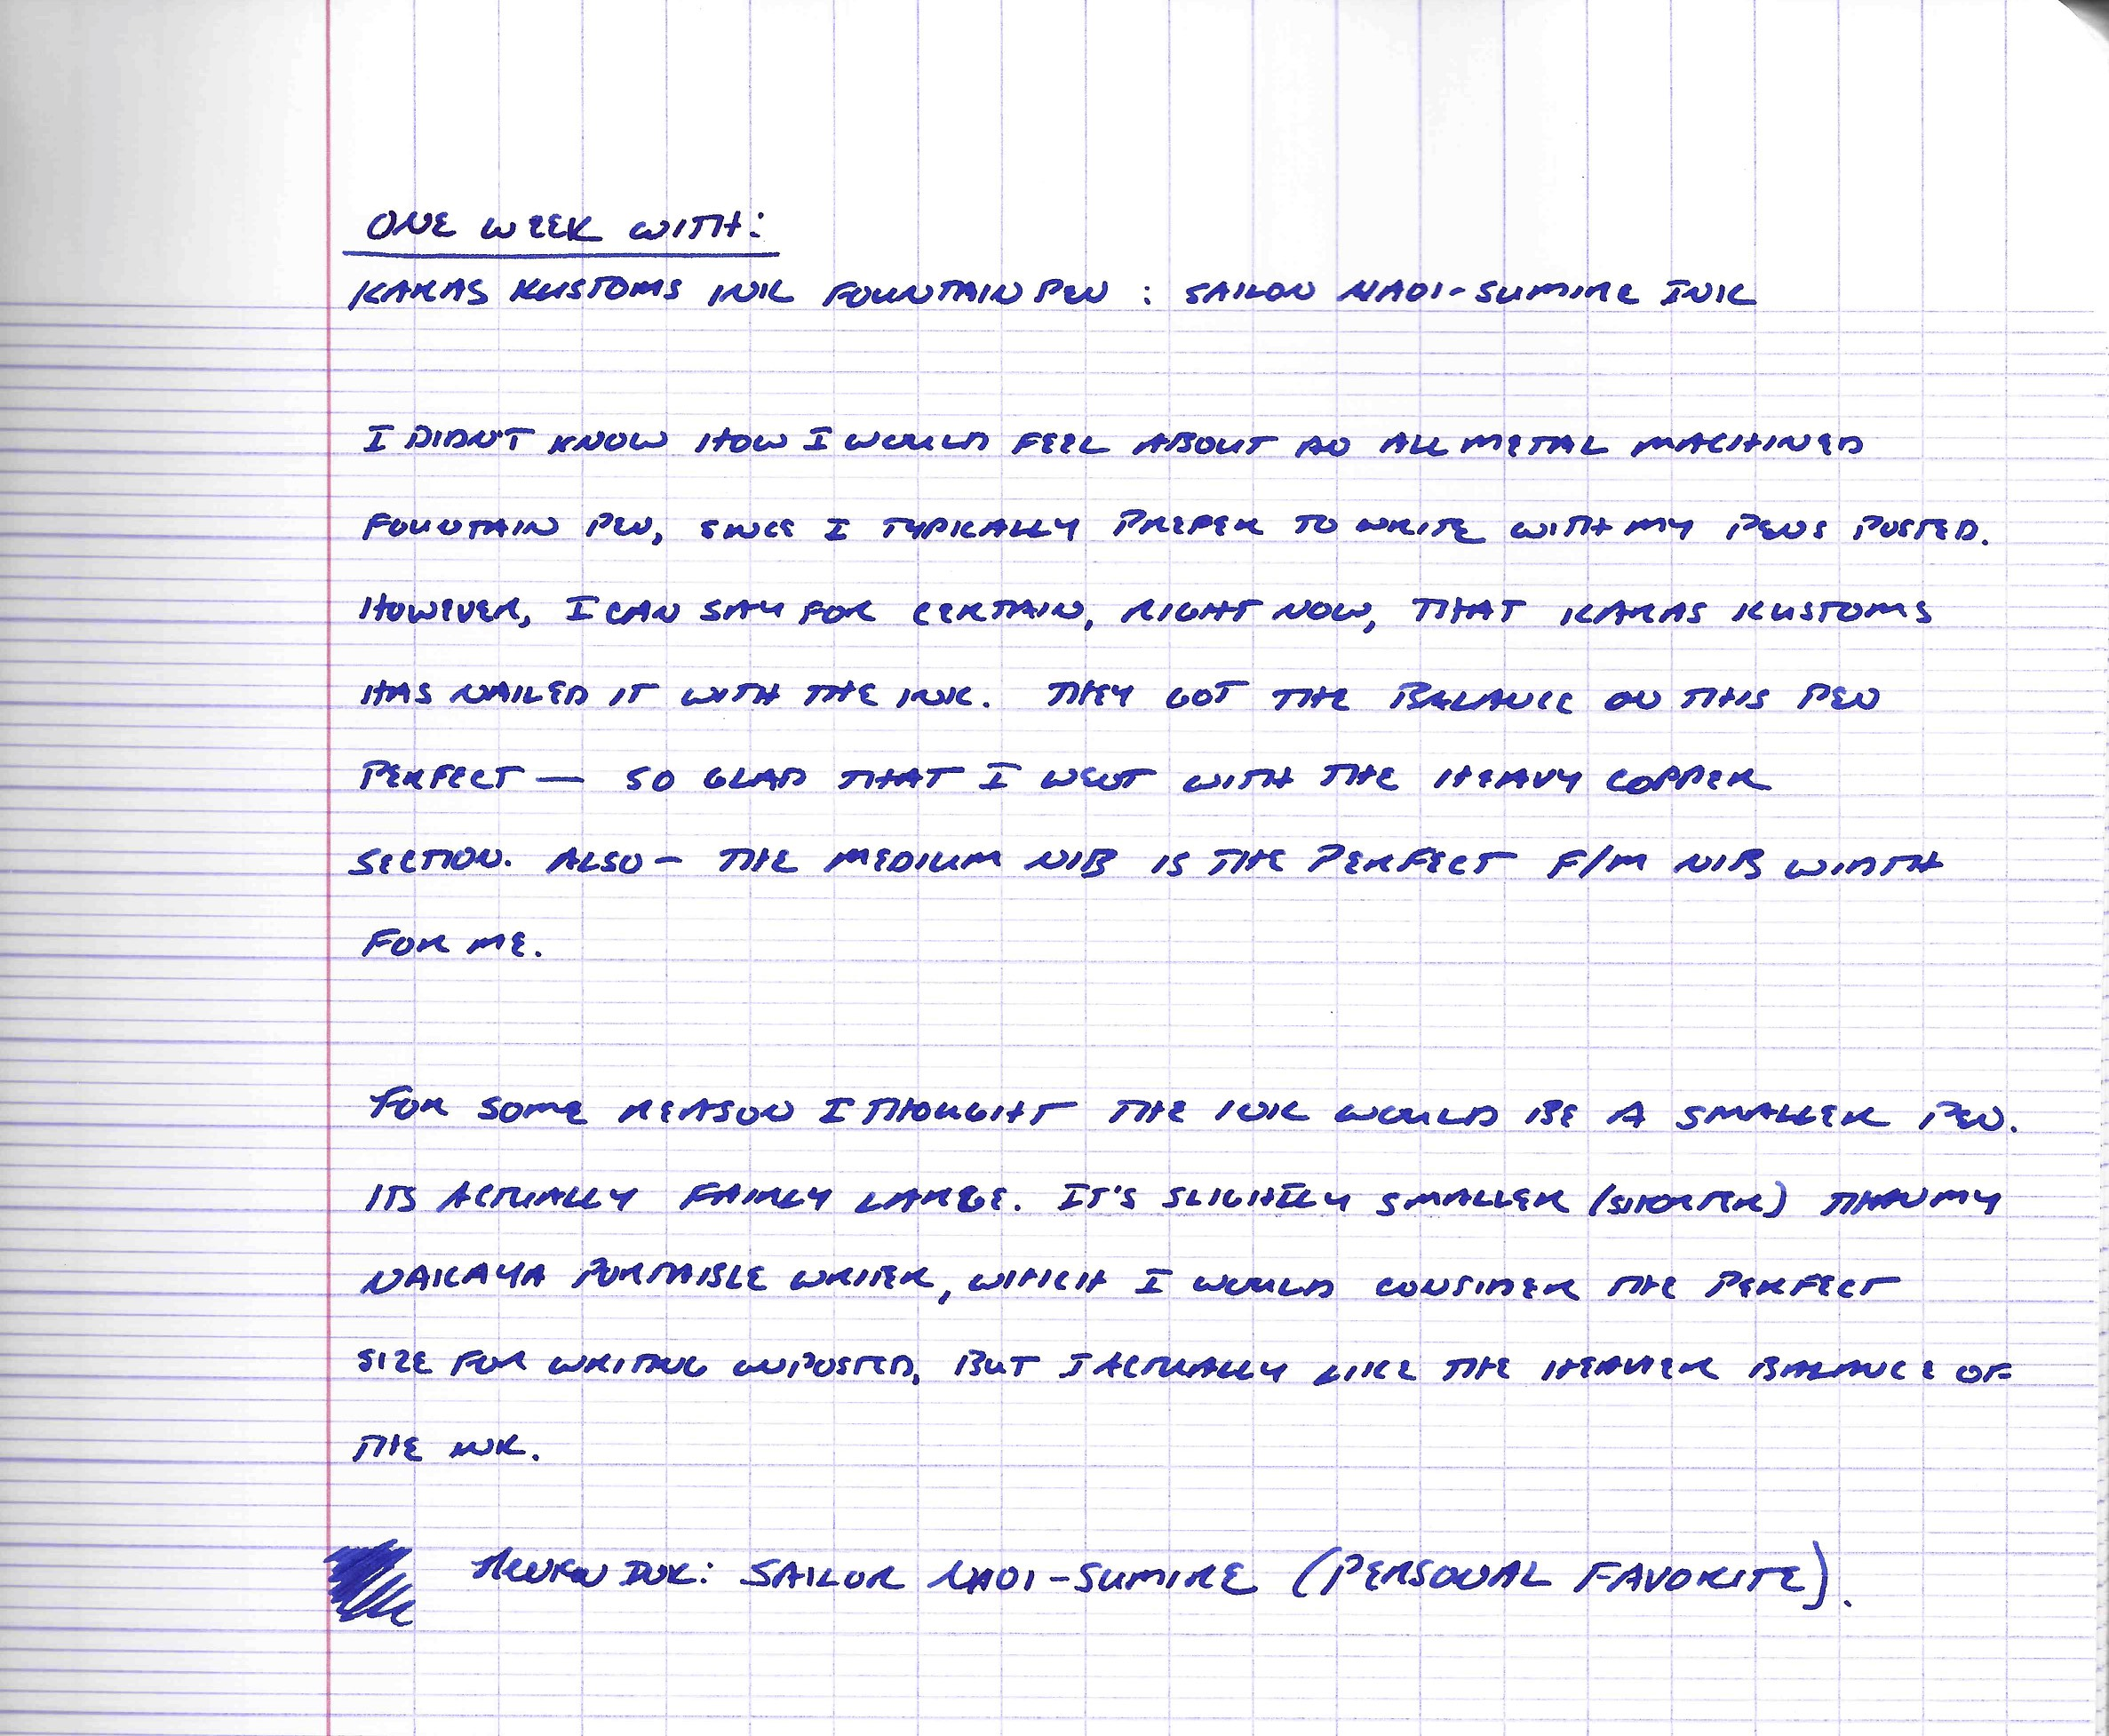 Karas Kustoms Ink handwritten review with Sailor Naoi-Sumire.